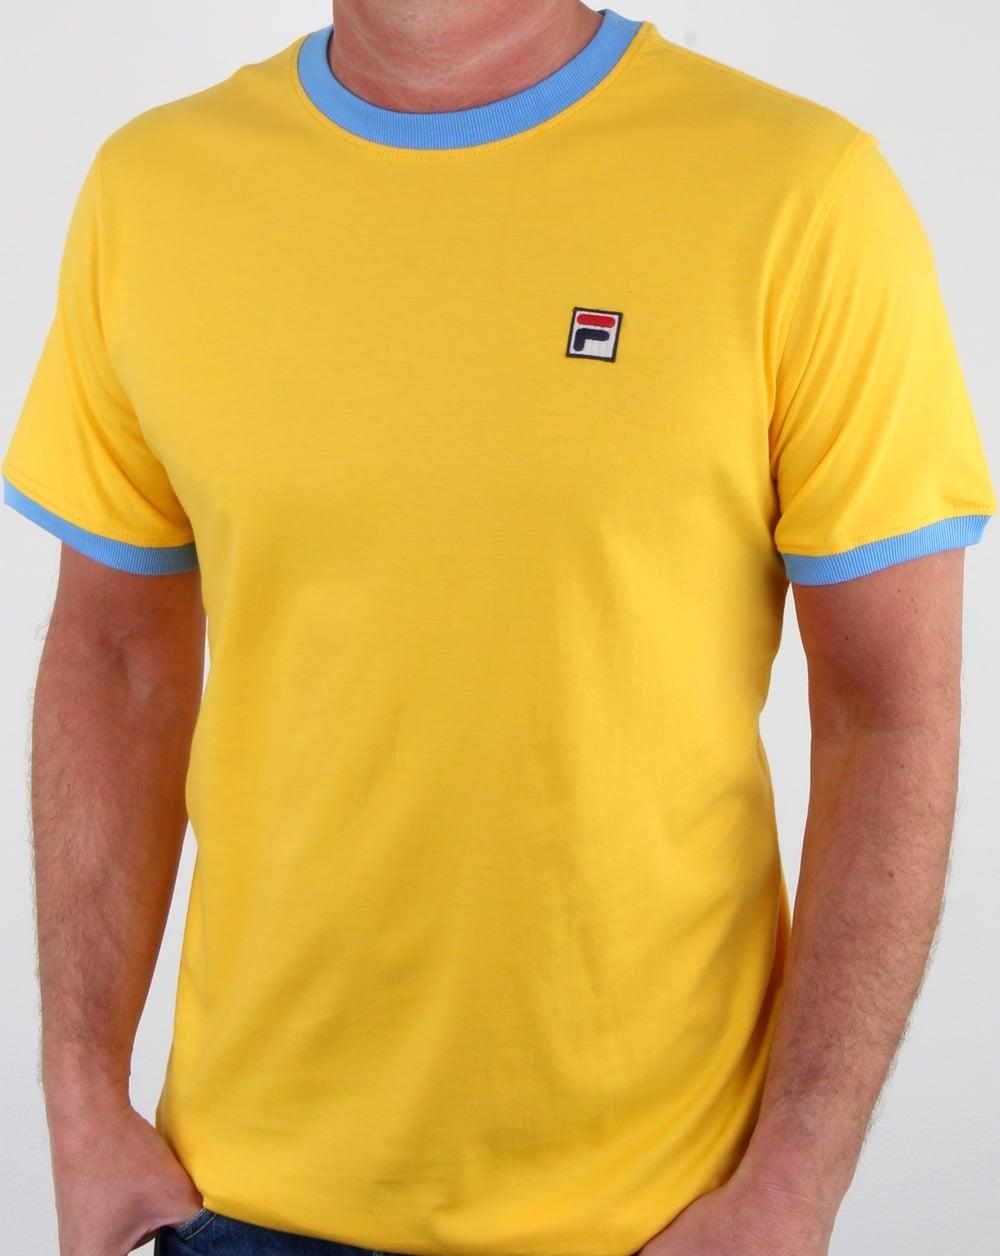 e5f92e311a39 Fila Vintage Fila Vintage Marconi T Shirt Yellow lake Blue